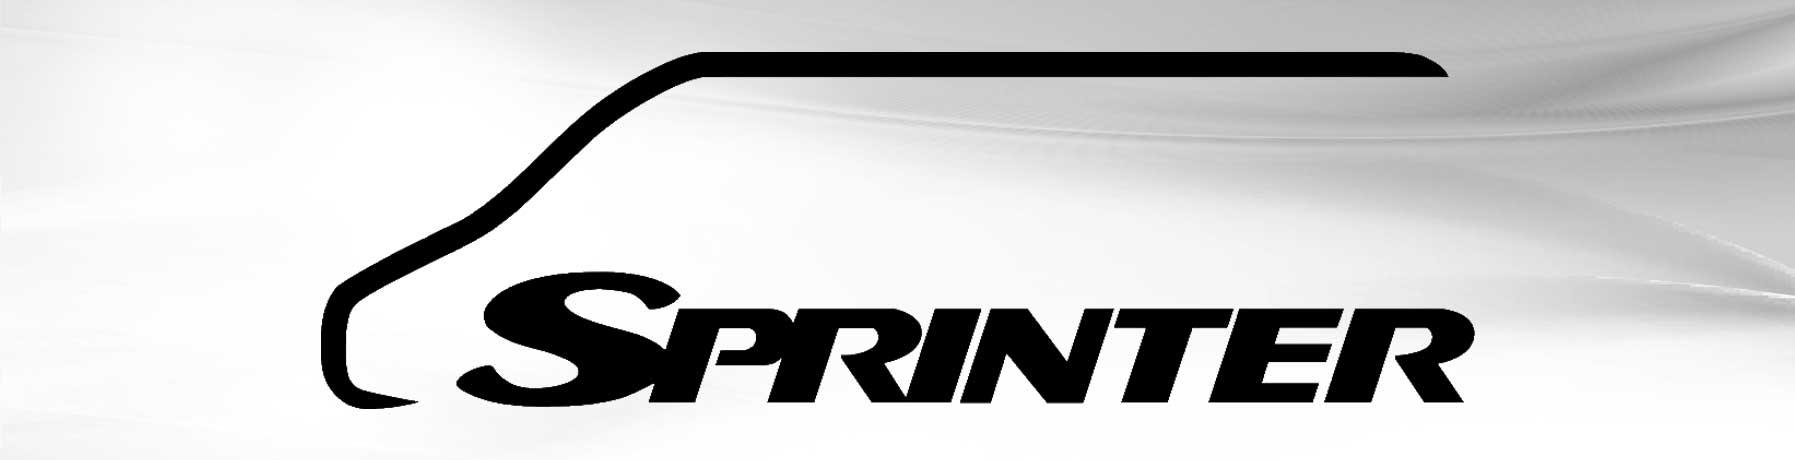 Merc Sprinter - Mercie J Auto Care in Mesa, AZ